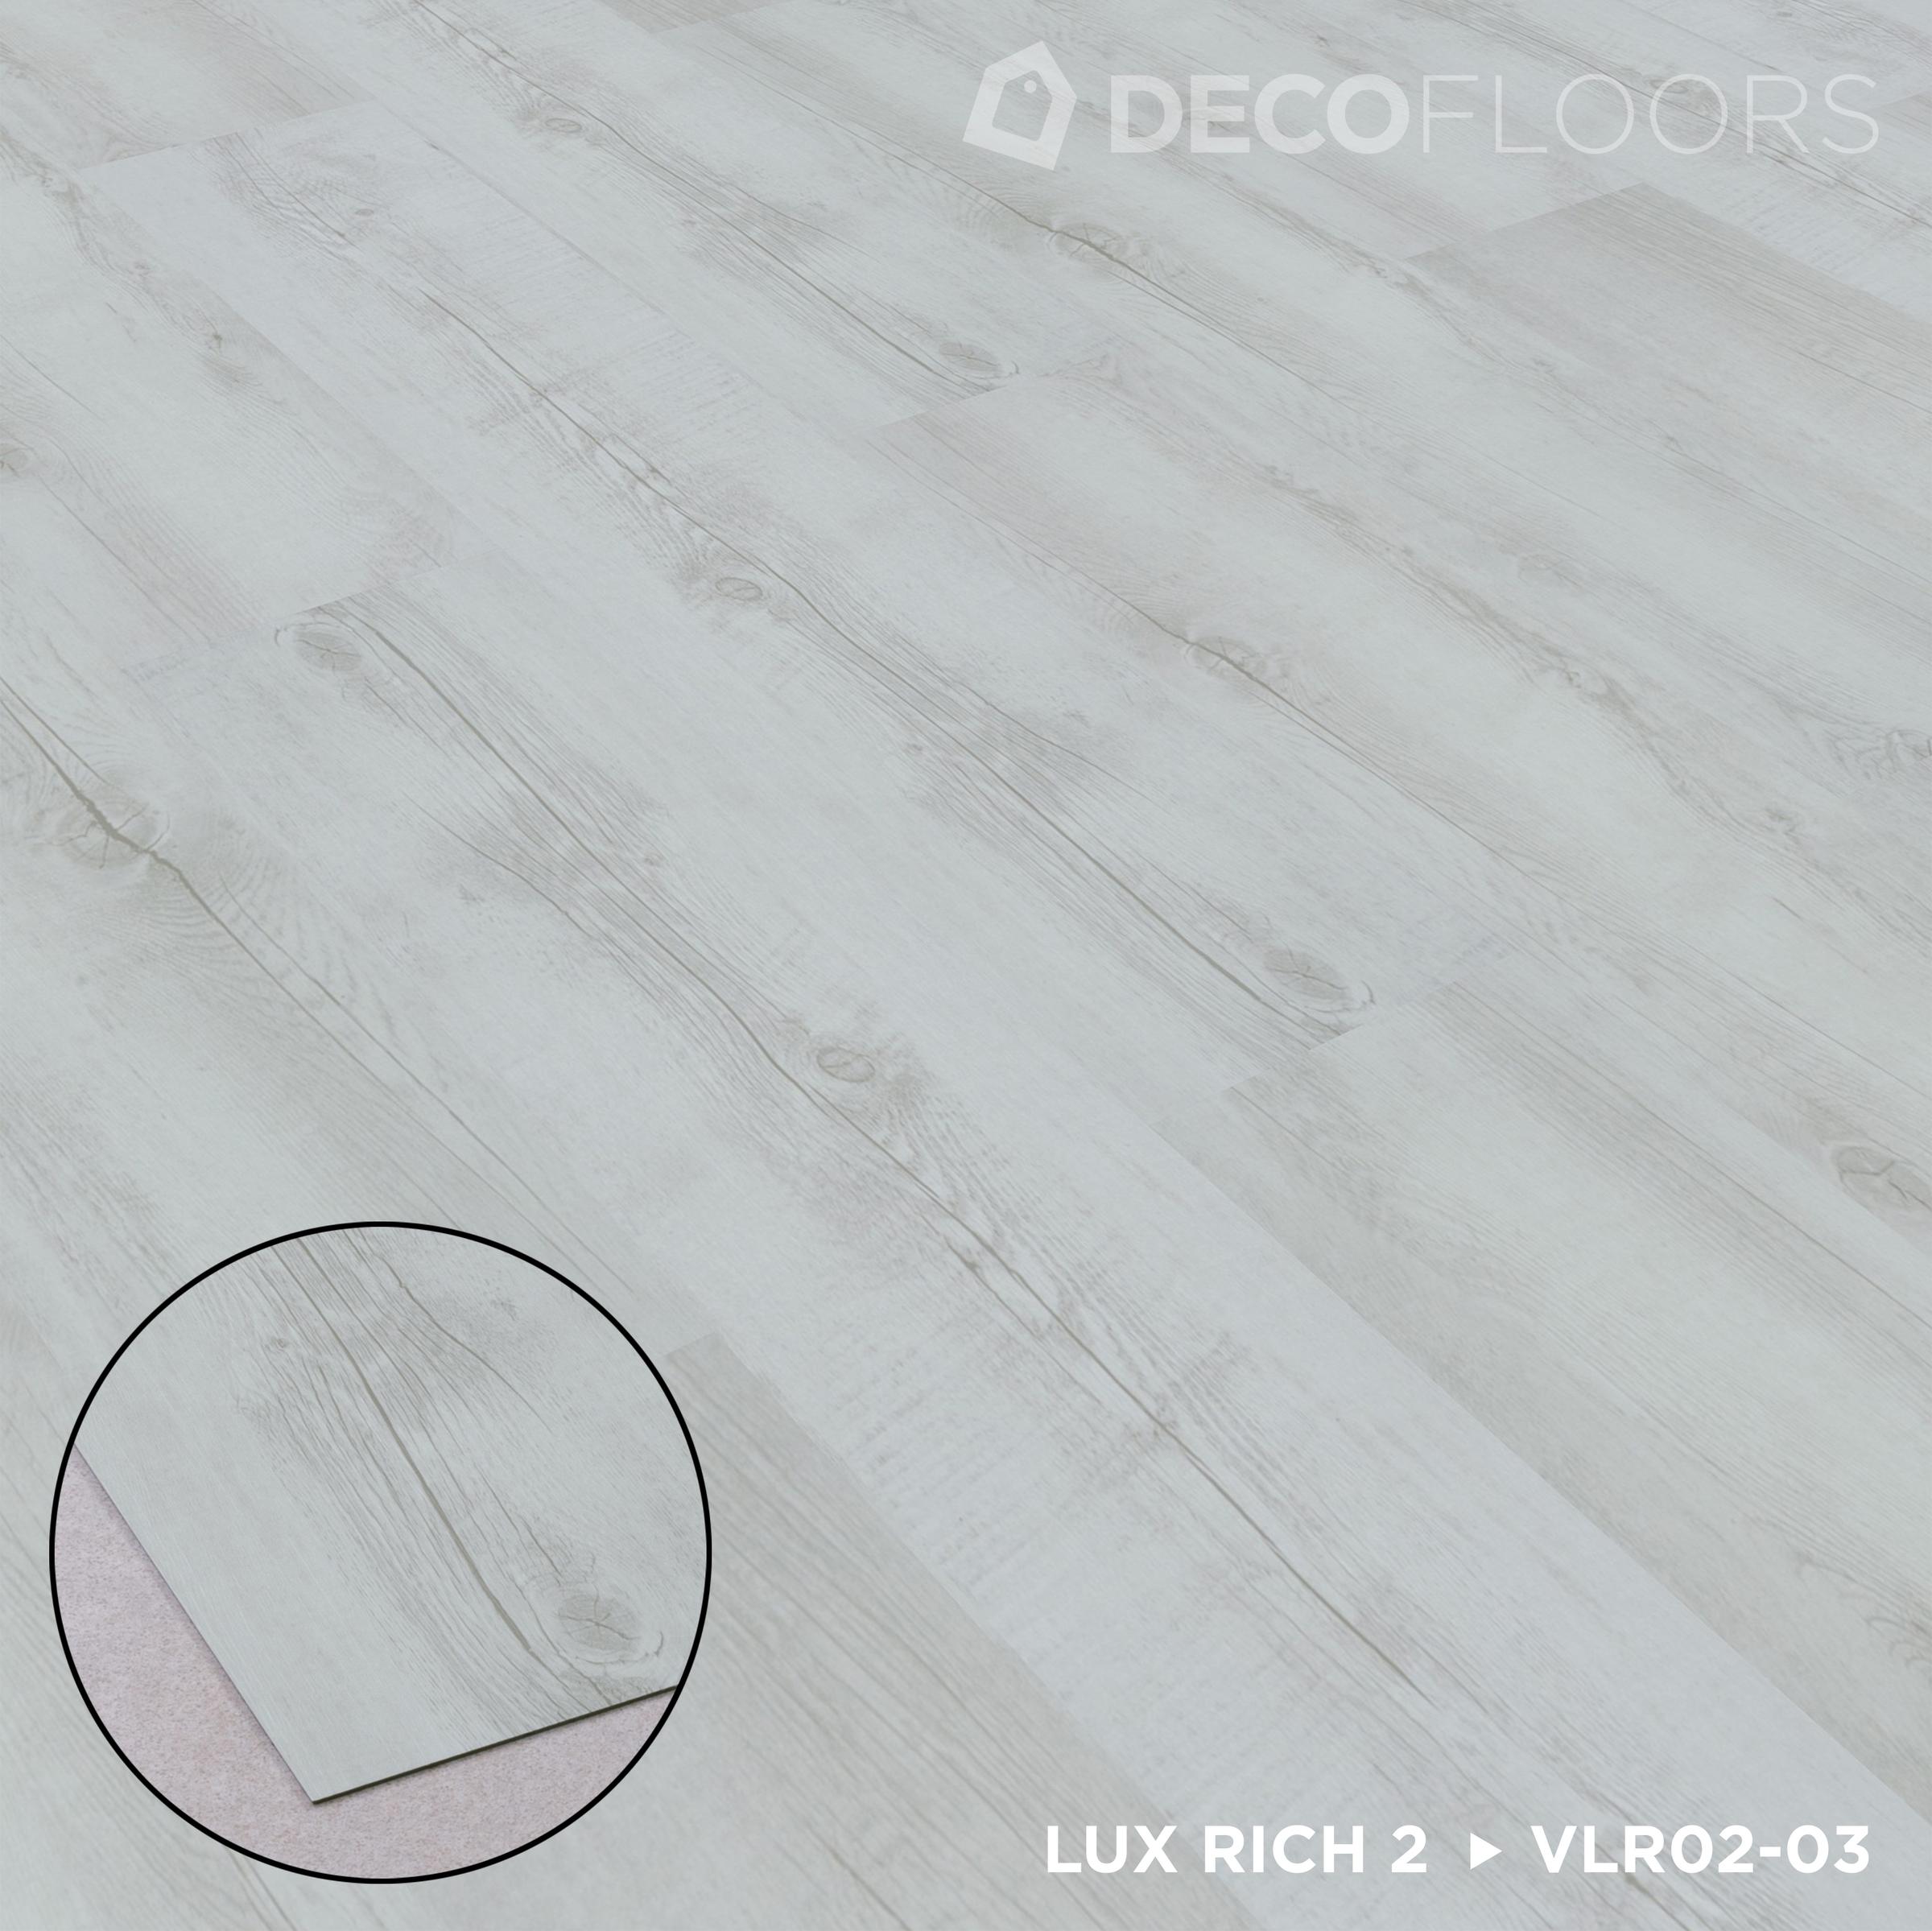 VLR02-03 - 3.jpg